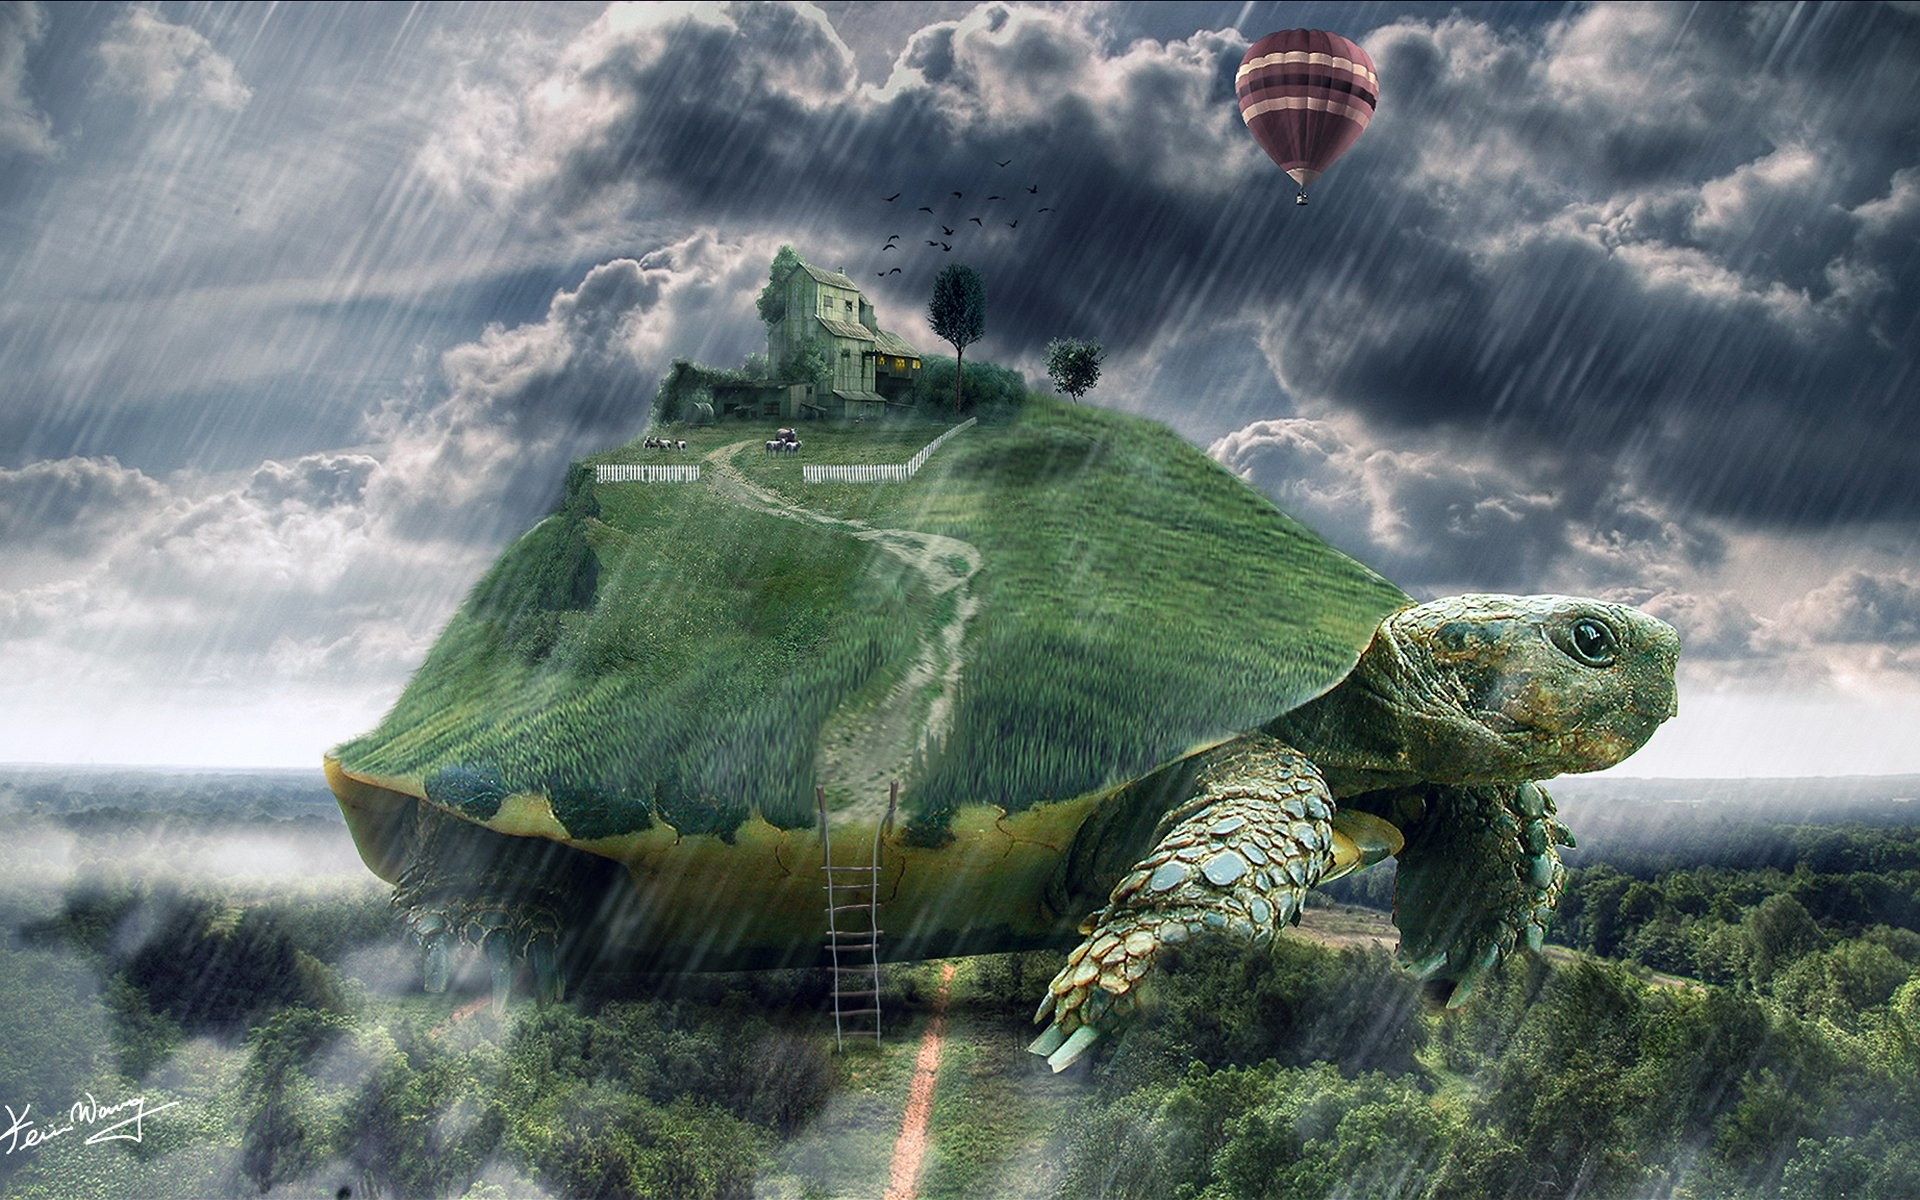 Wallpaper world on turtle